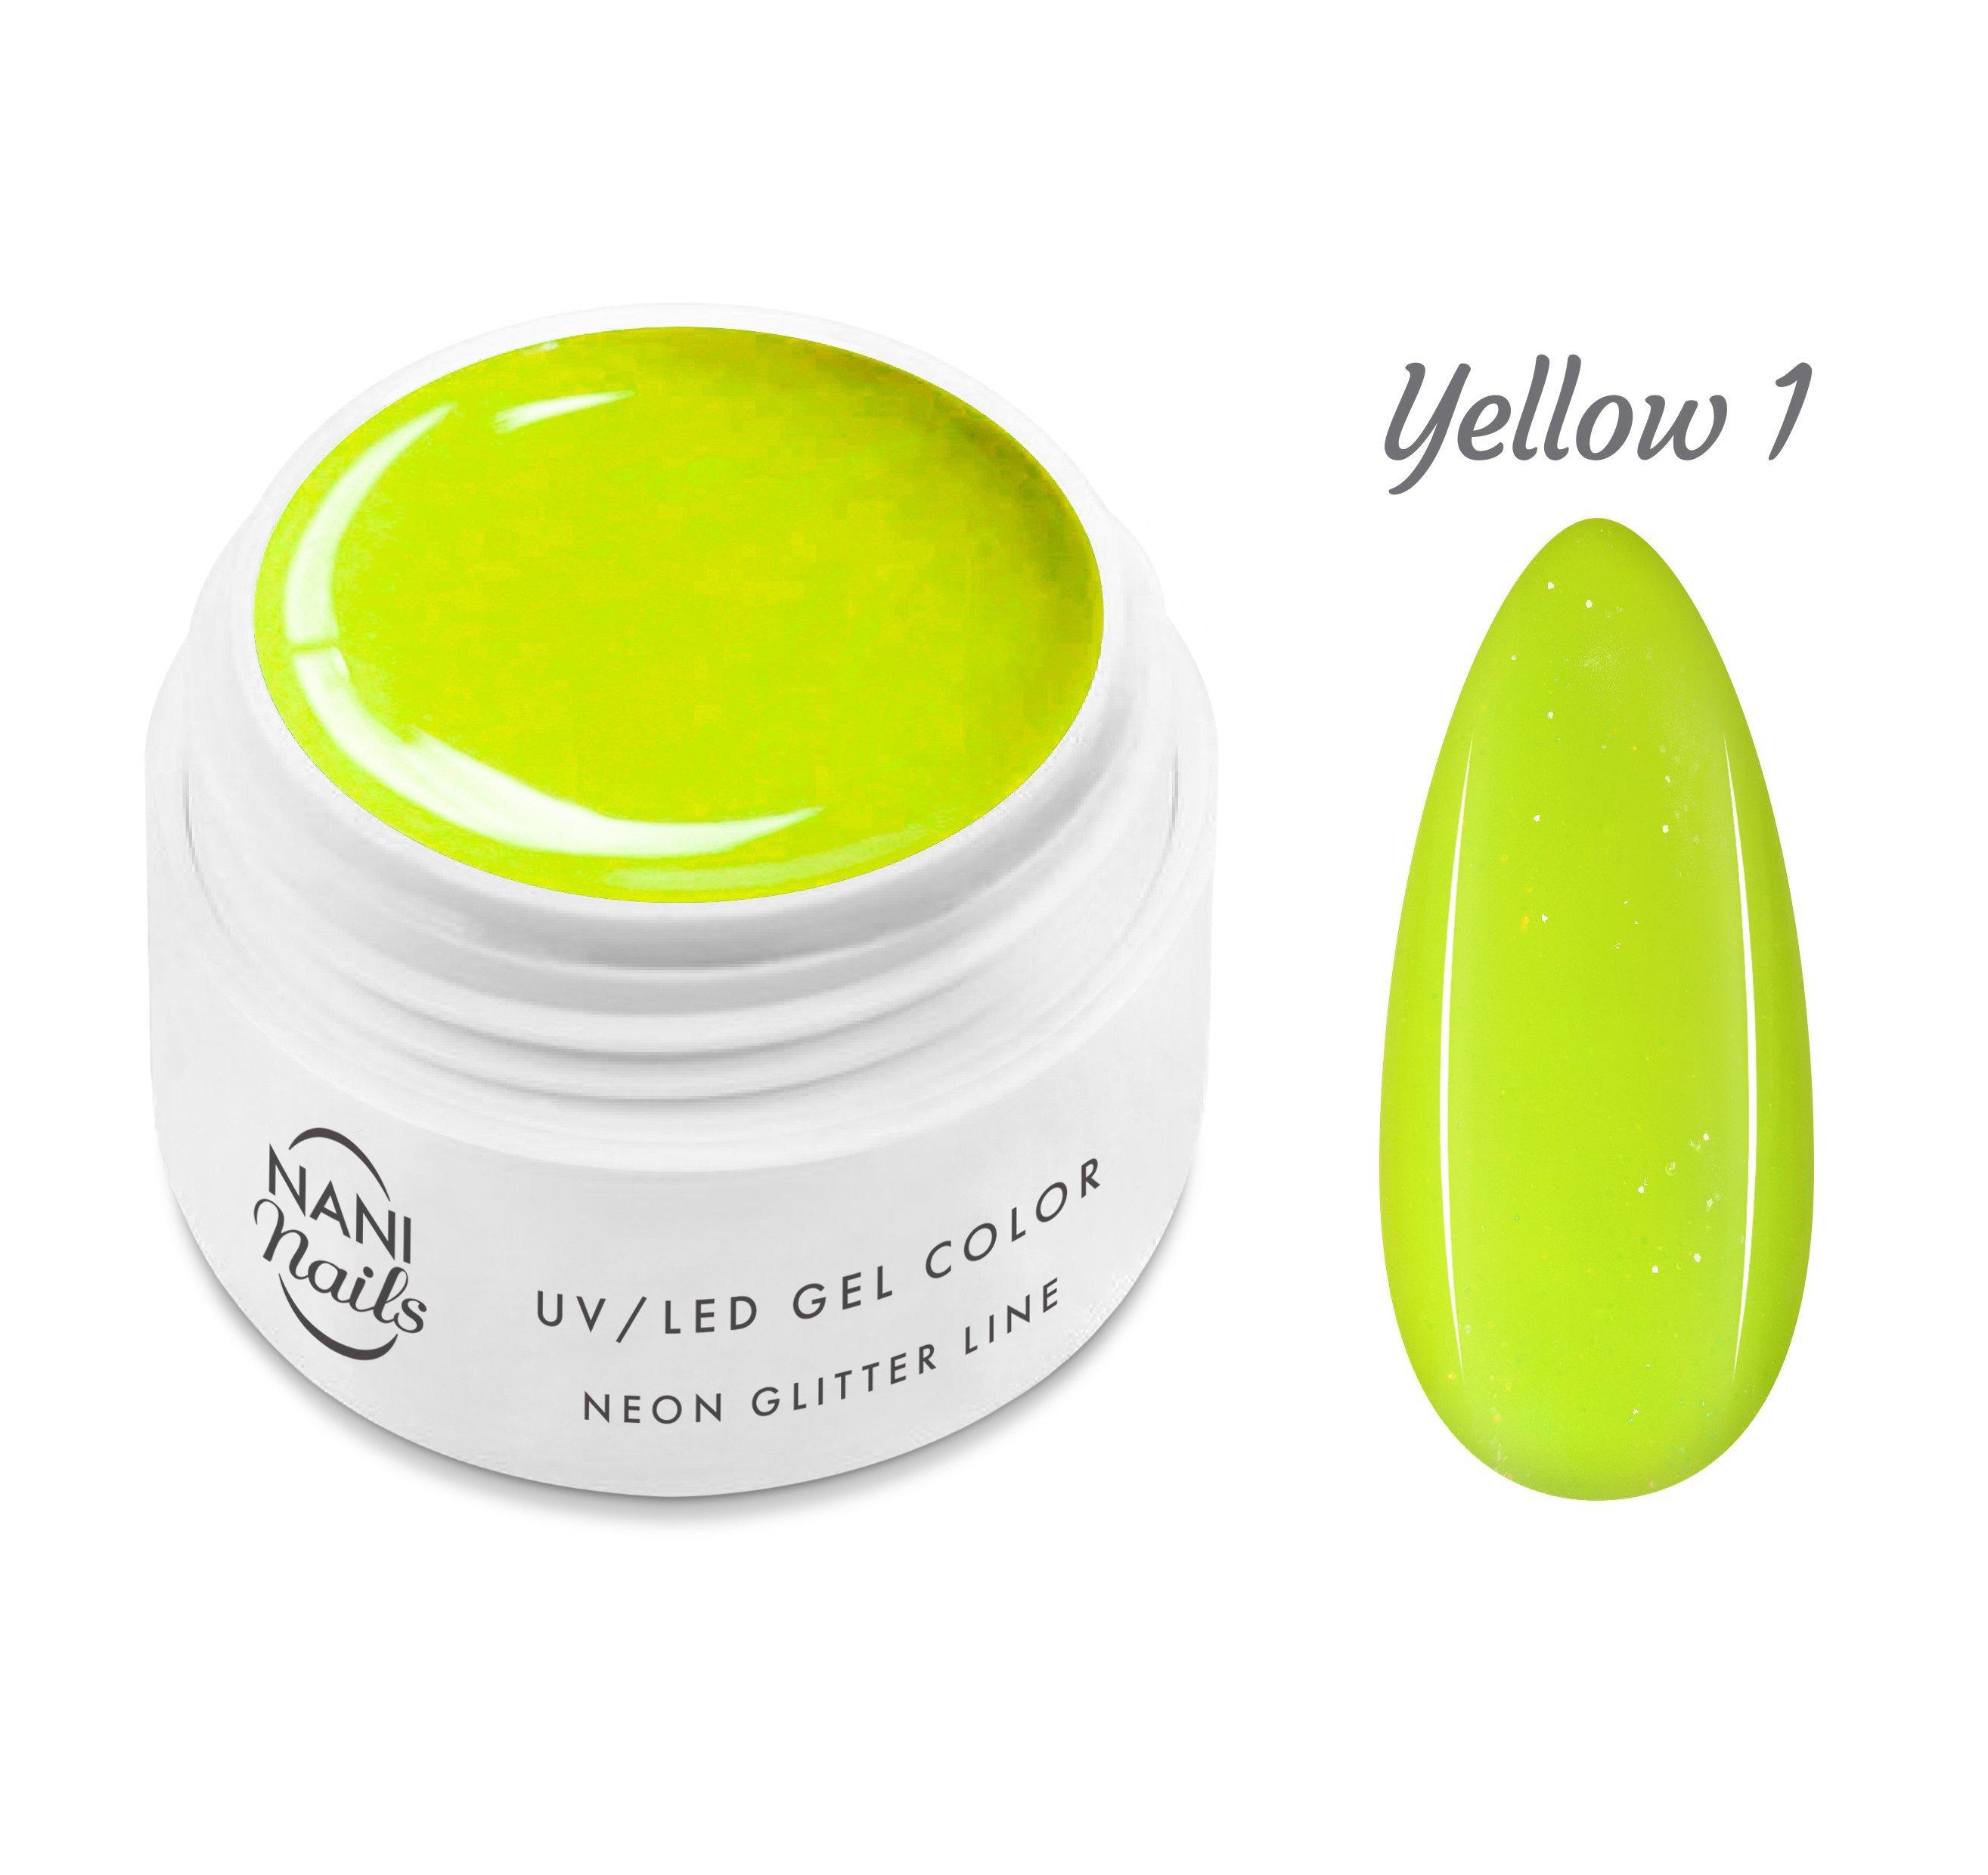 NANI UV gél Neon Glitter Line 5 ml - Yellow